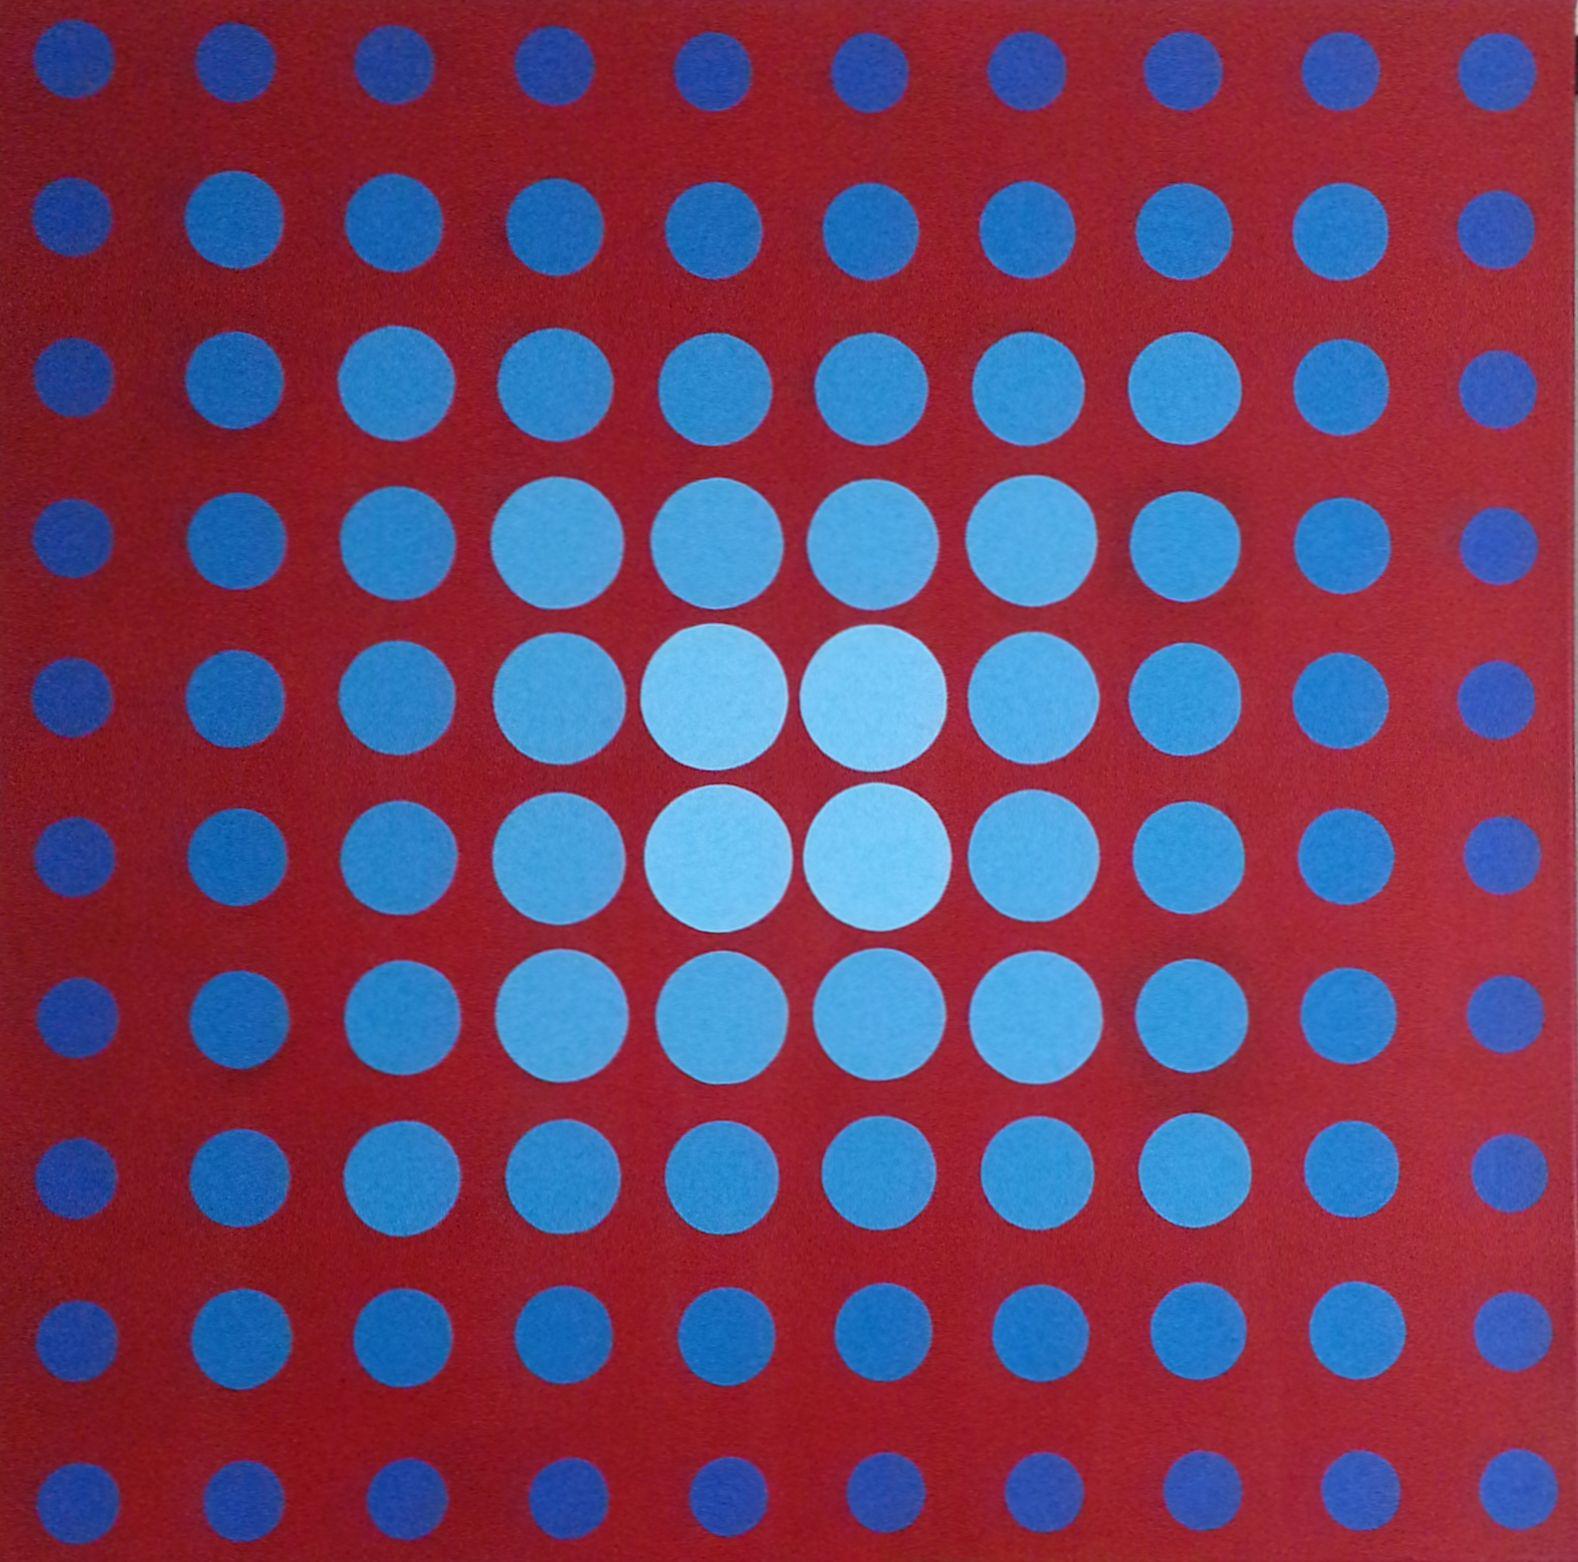 Stig Løvenkrands nr.239 100 Circles